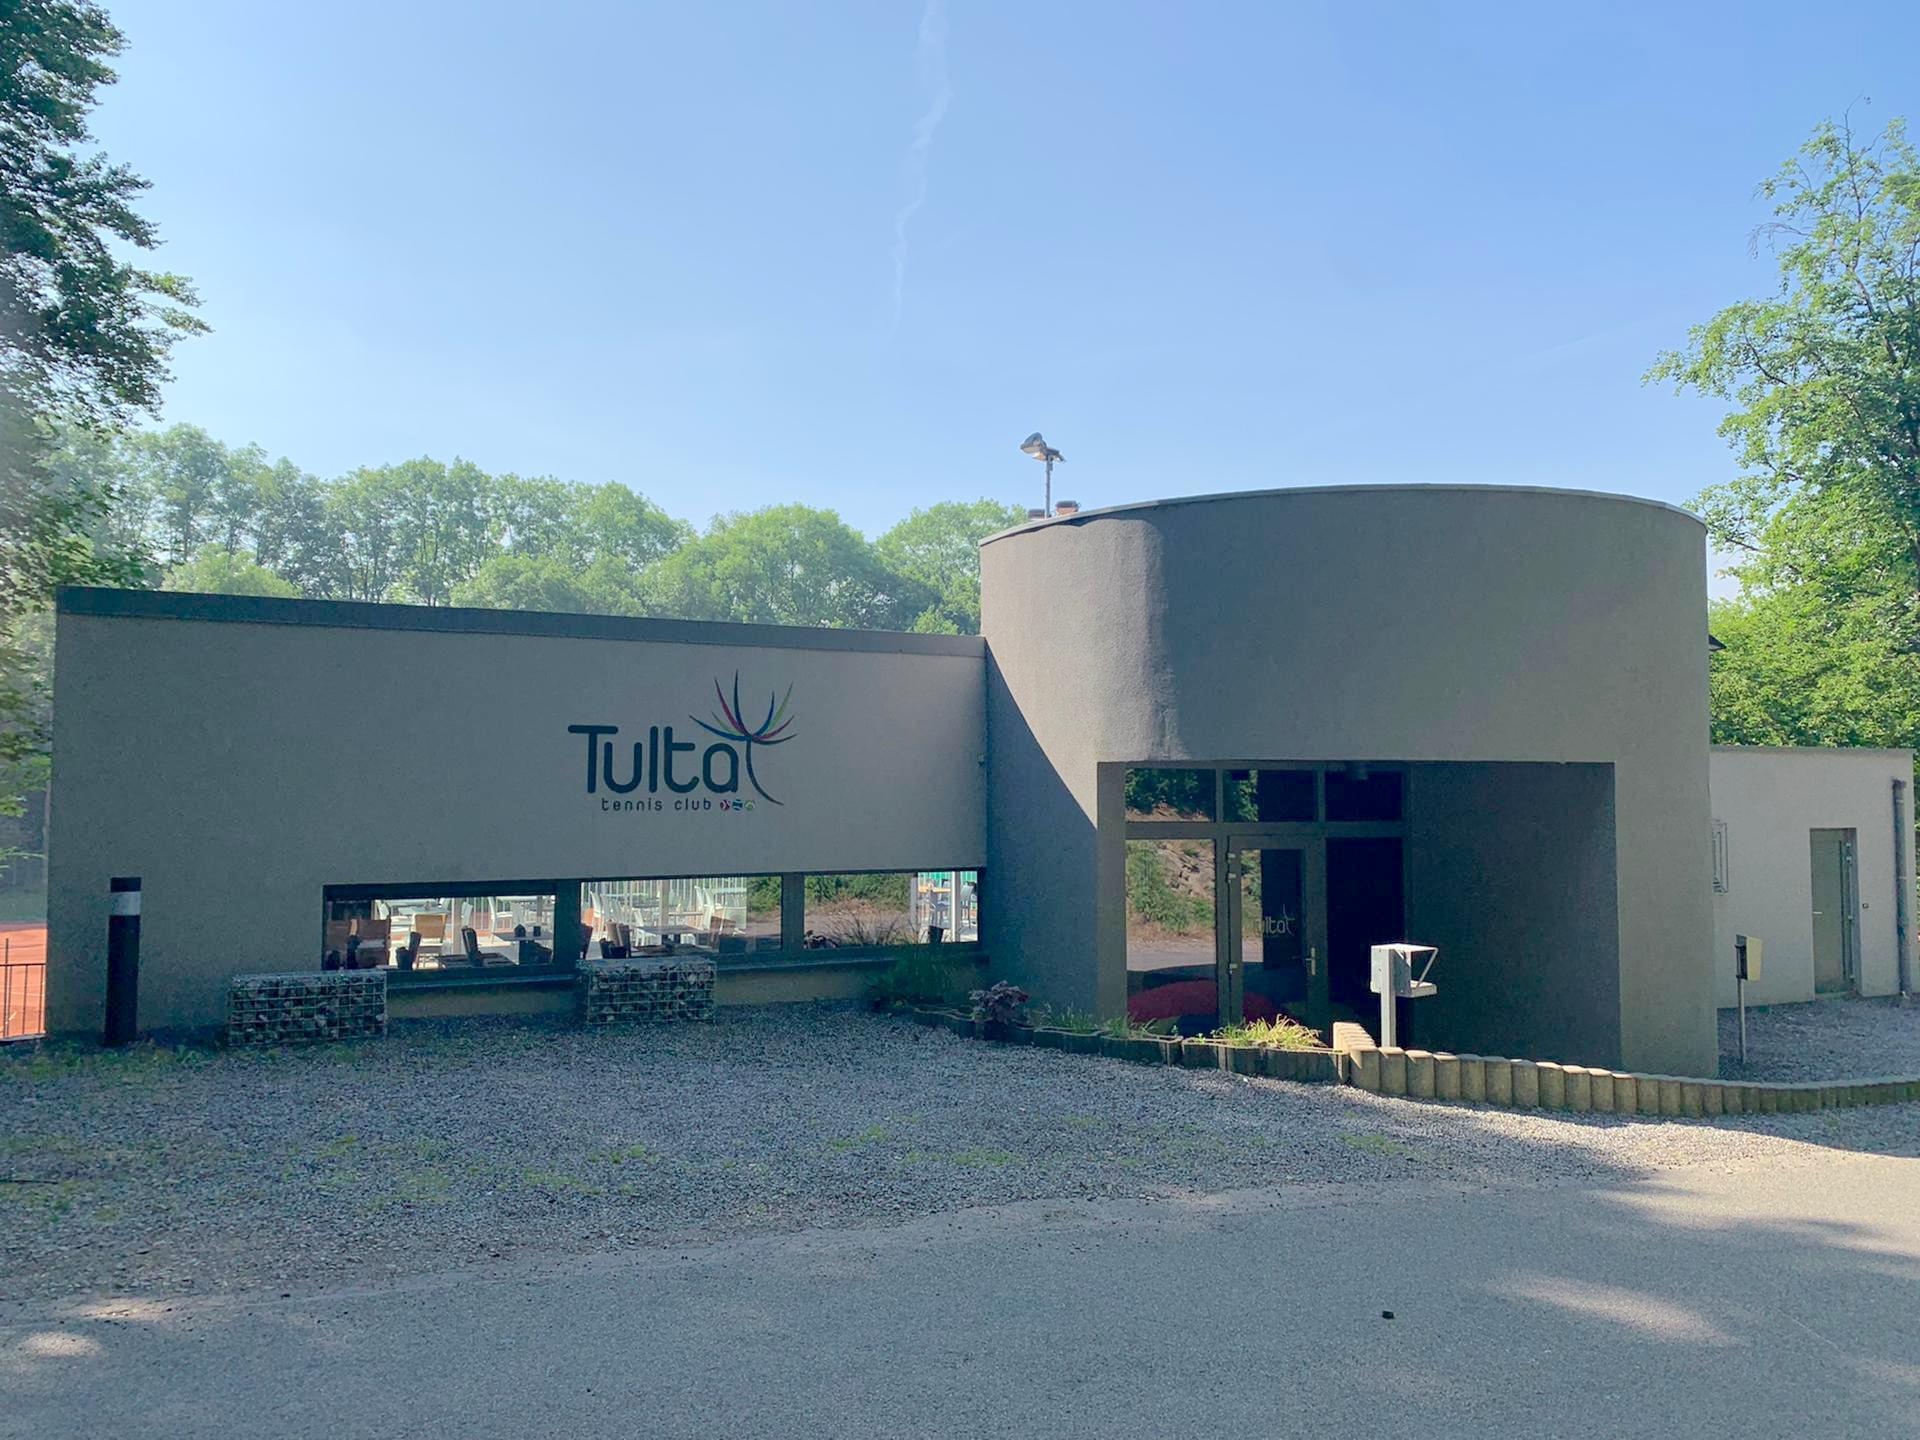 Club house Tc Tultay